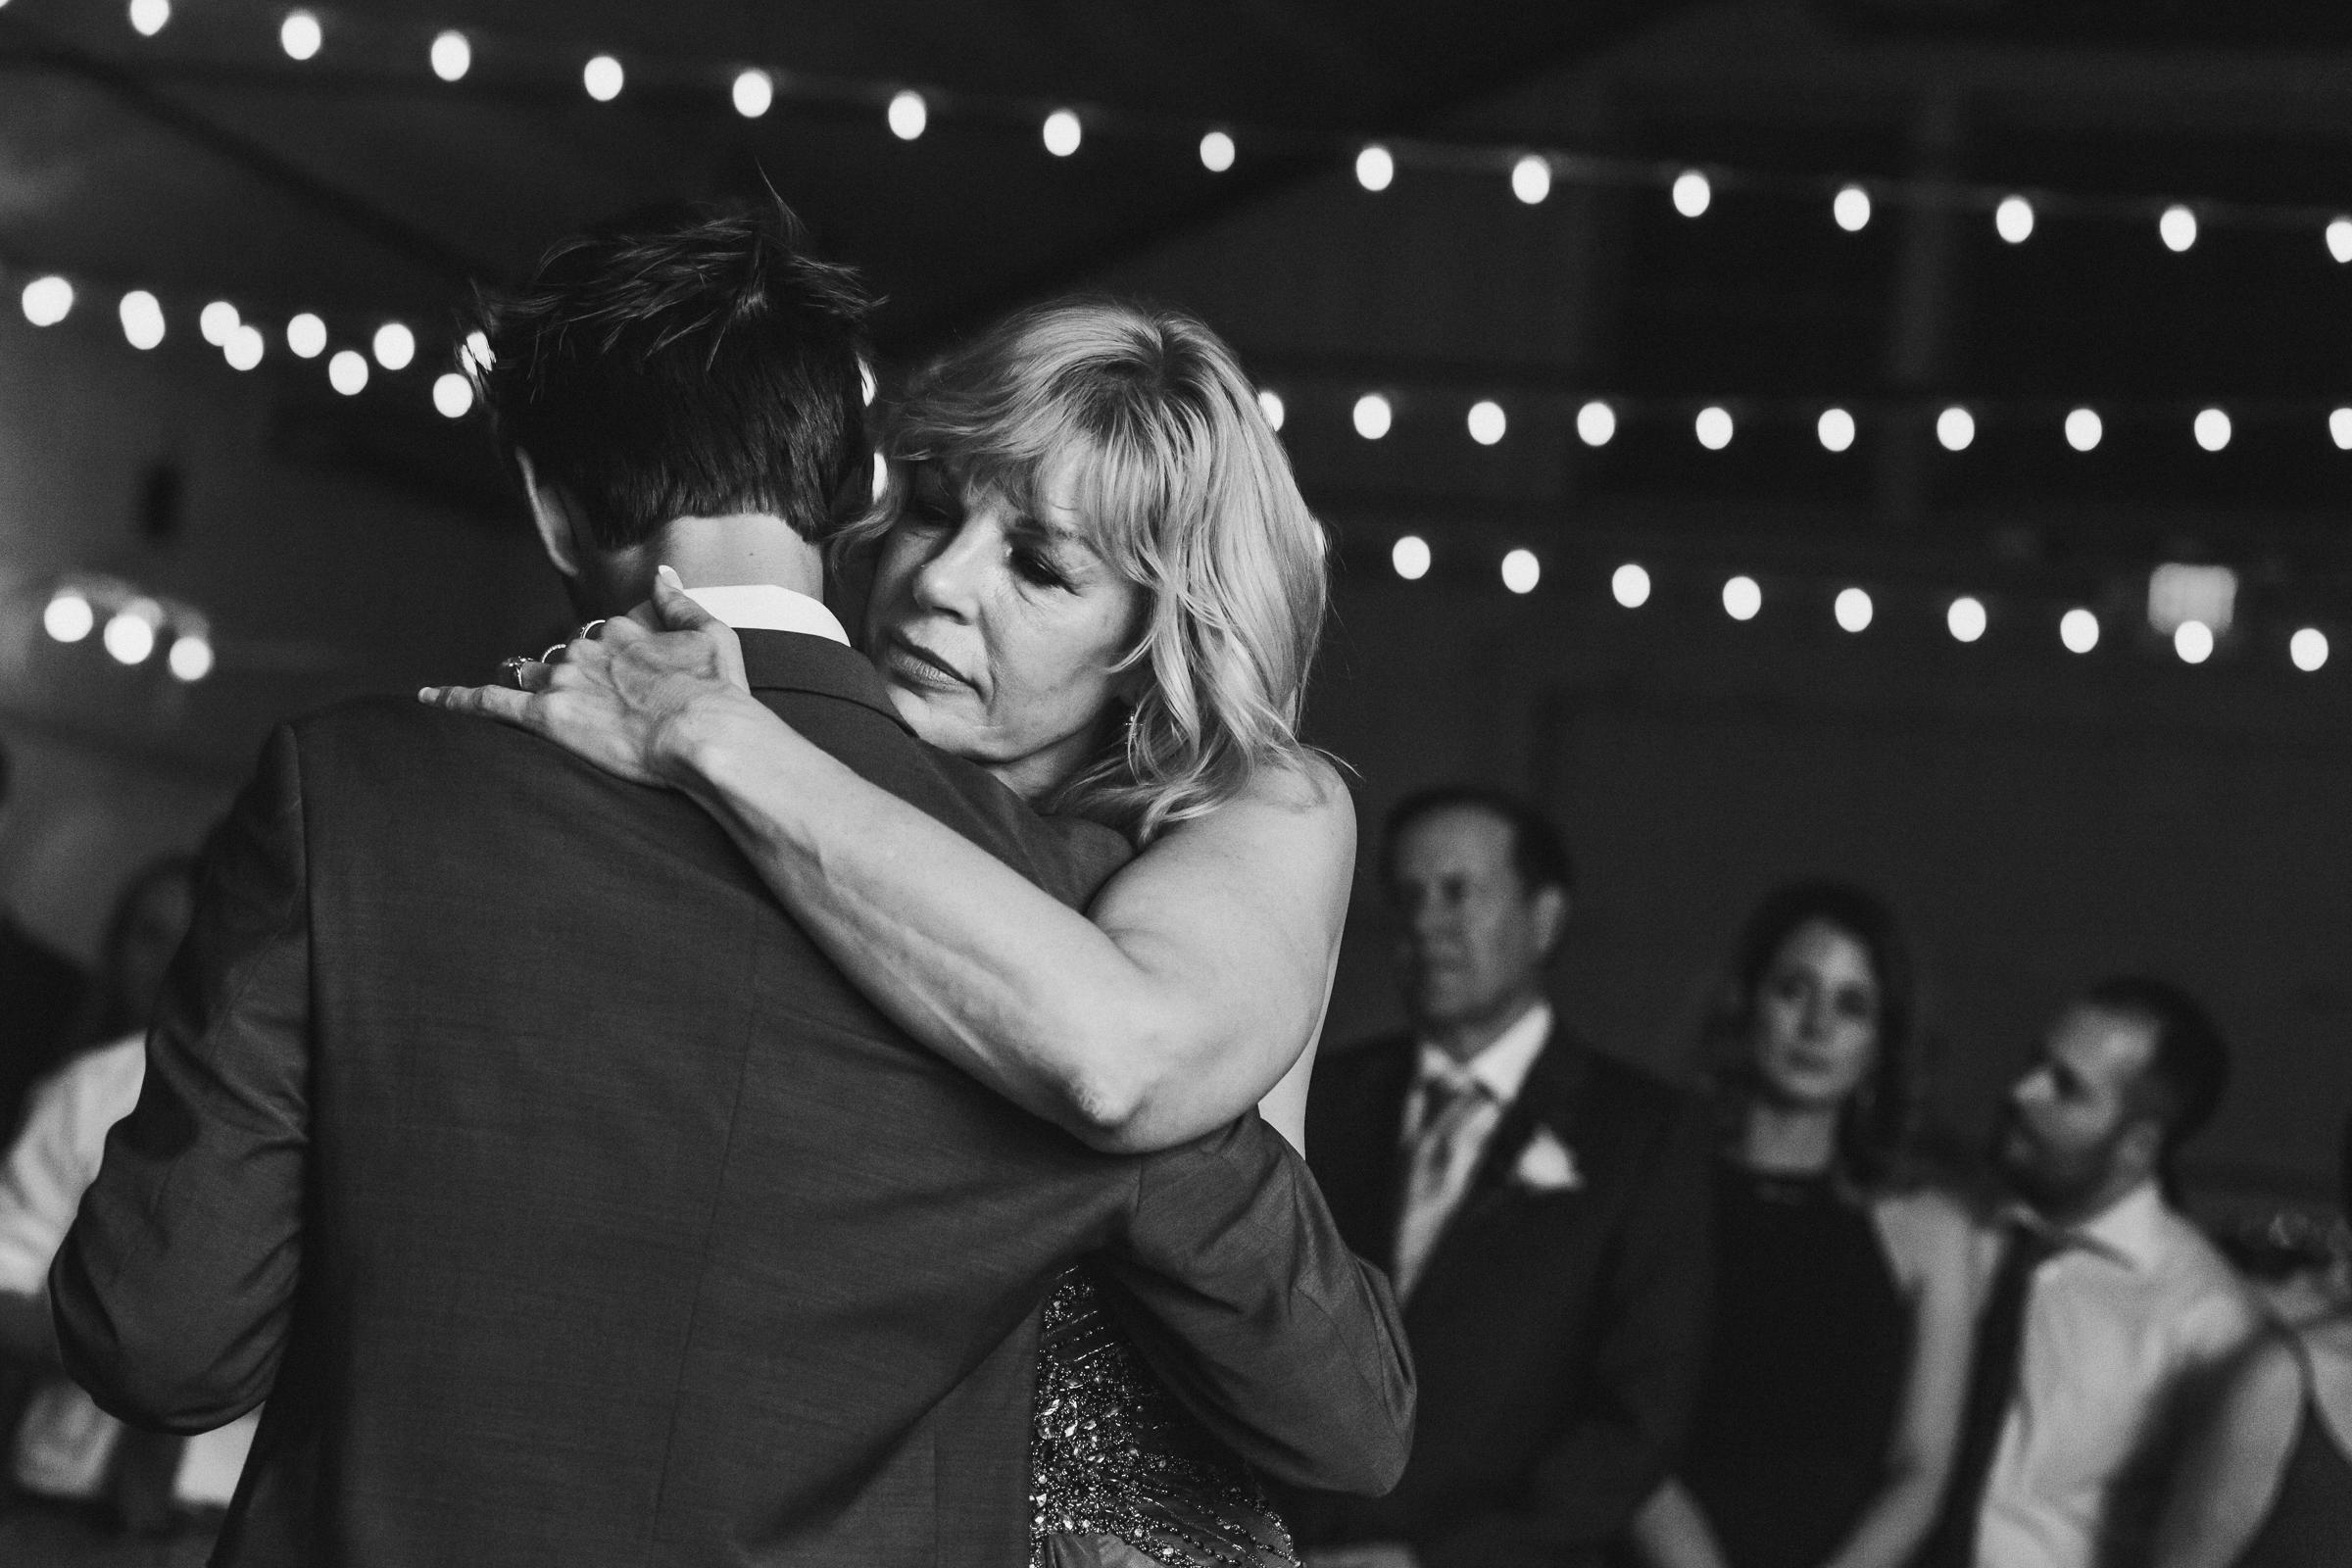 Martha-Clara-Vineyard-Long-Island-Documentary-Wedding-Photographer-98.jpg